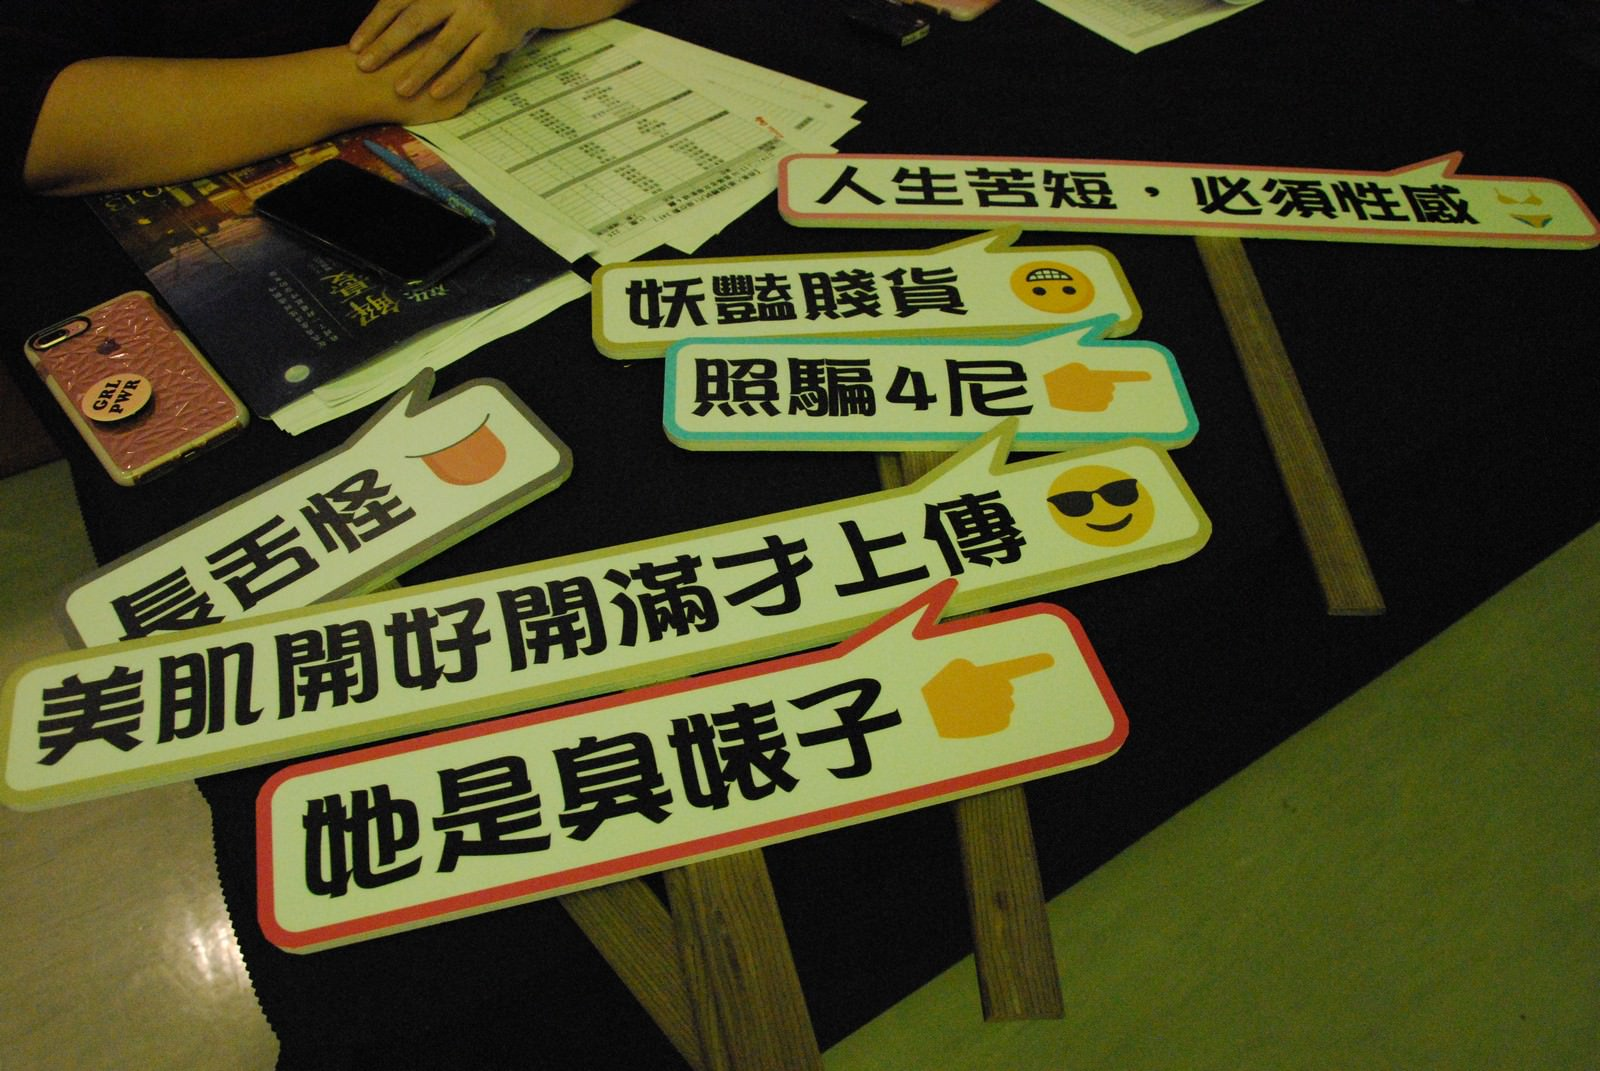 Movie, 恭喜八婆(香港, 2019年) / 恭喜八婆(台灣) / Miss Behavior(英文), 廣告看板, 特映會拍照小道具